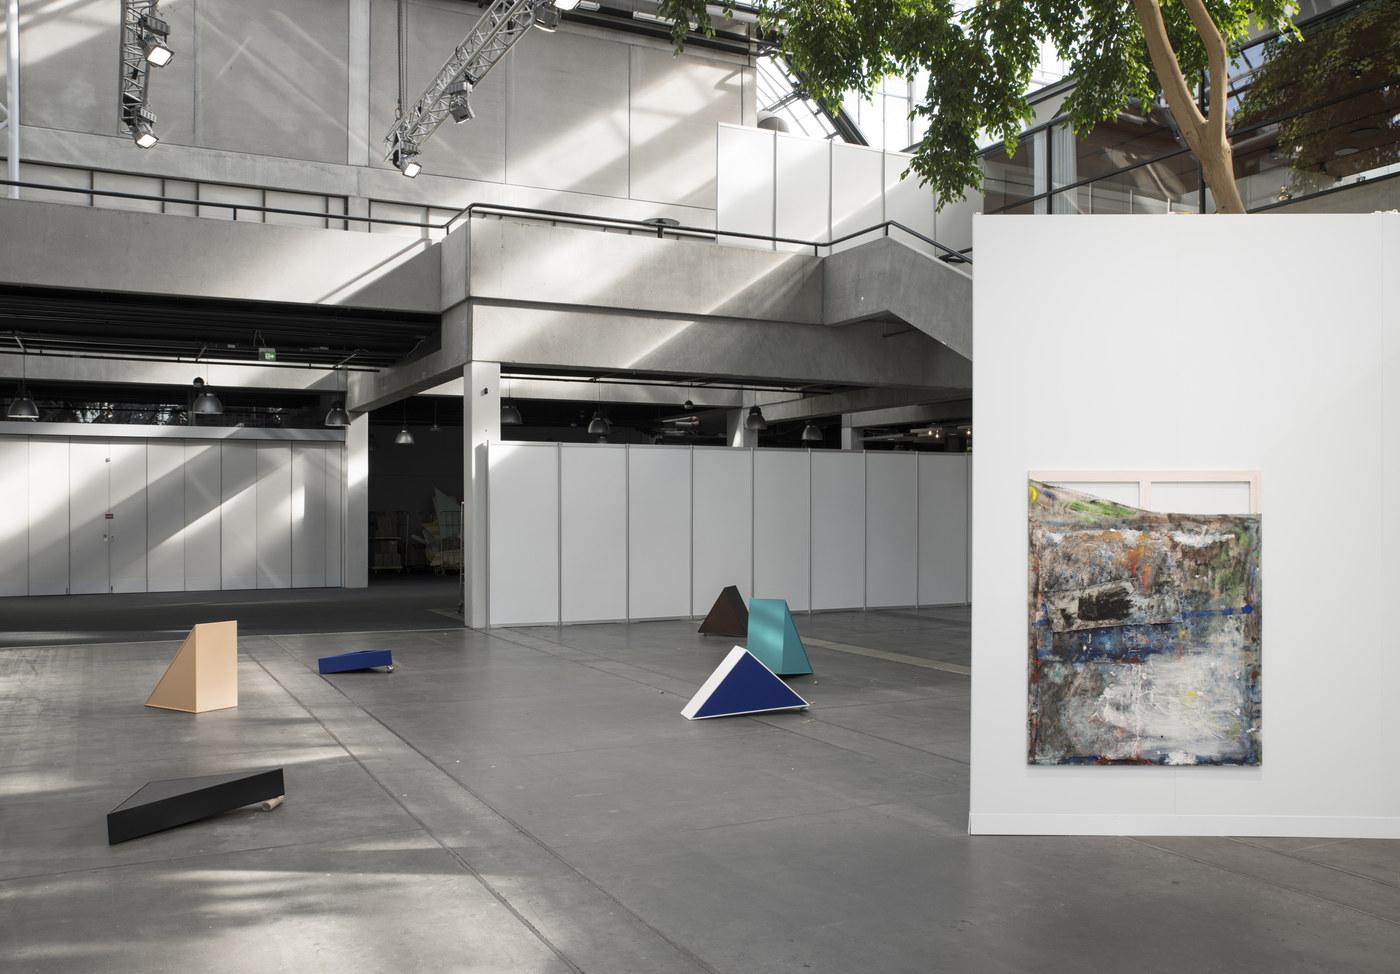 019_Installation view_Danmark